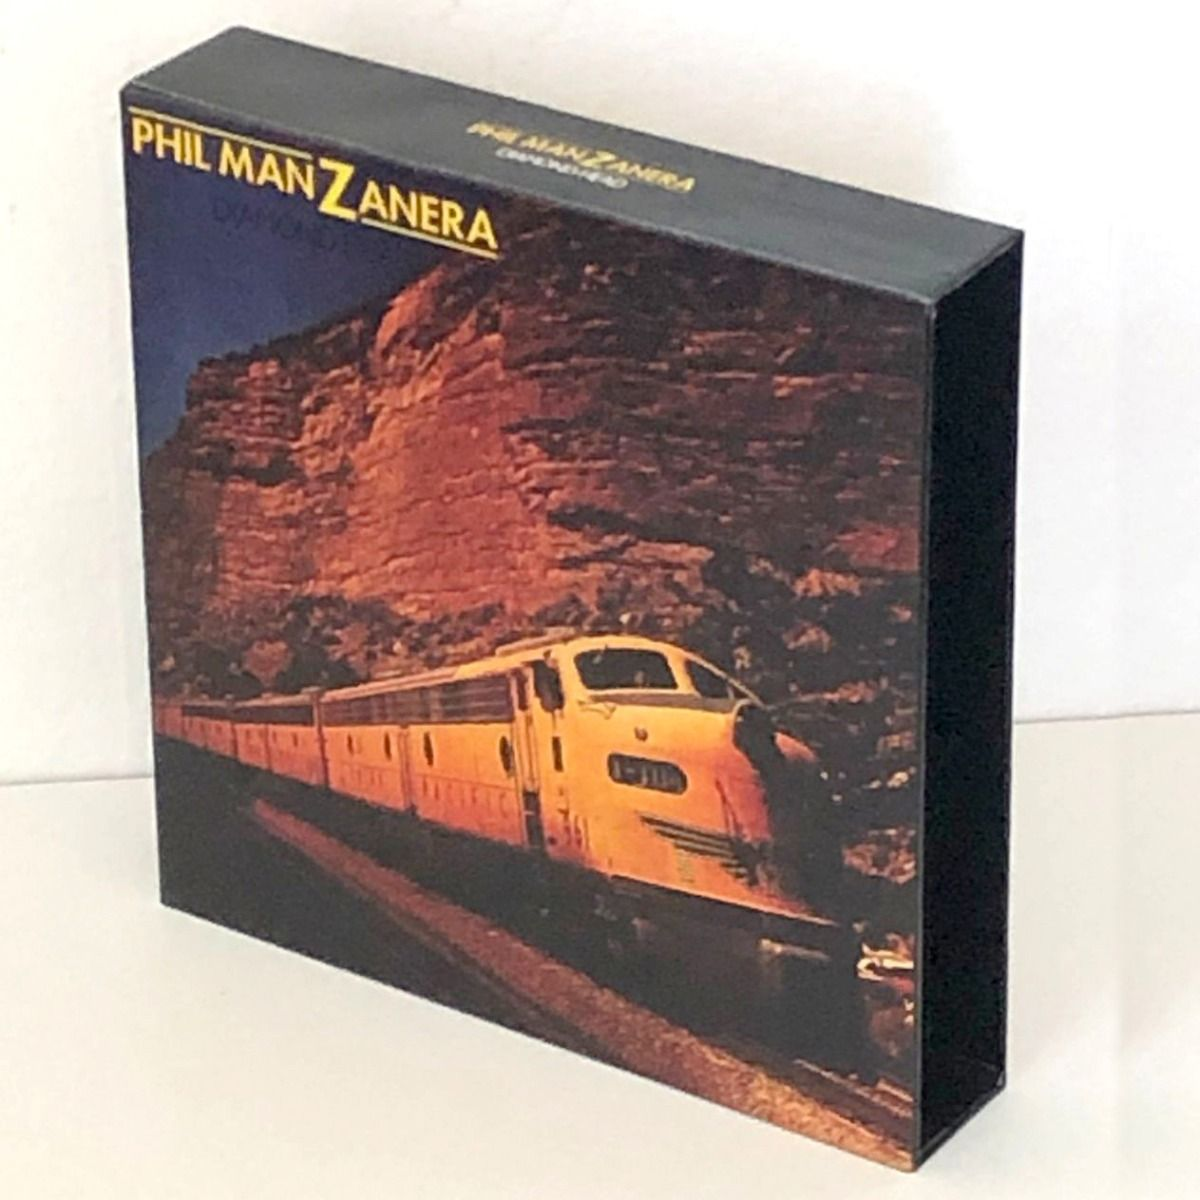 PHIL MANZANERA Promo Box